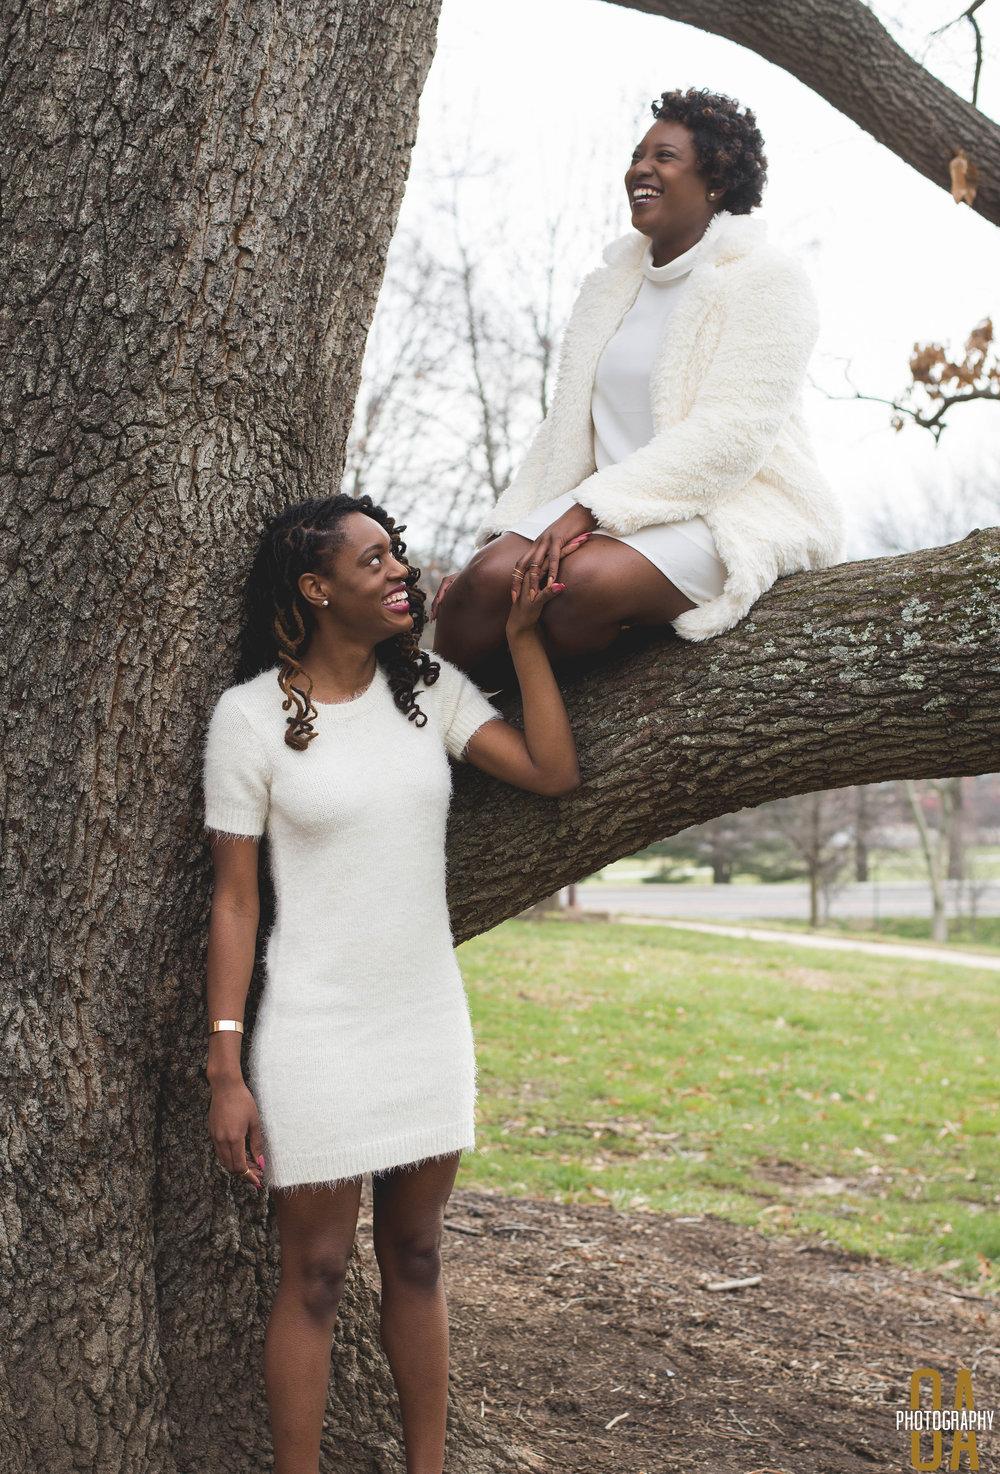 Photographer:  Olasubomi Adesoye  , Creative Director: Cheyenne Fogg  , Models: Nzinga Acey (right)&Bria Sladden (left)